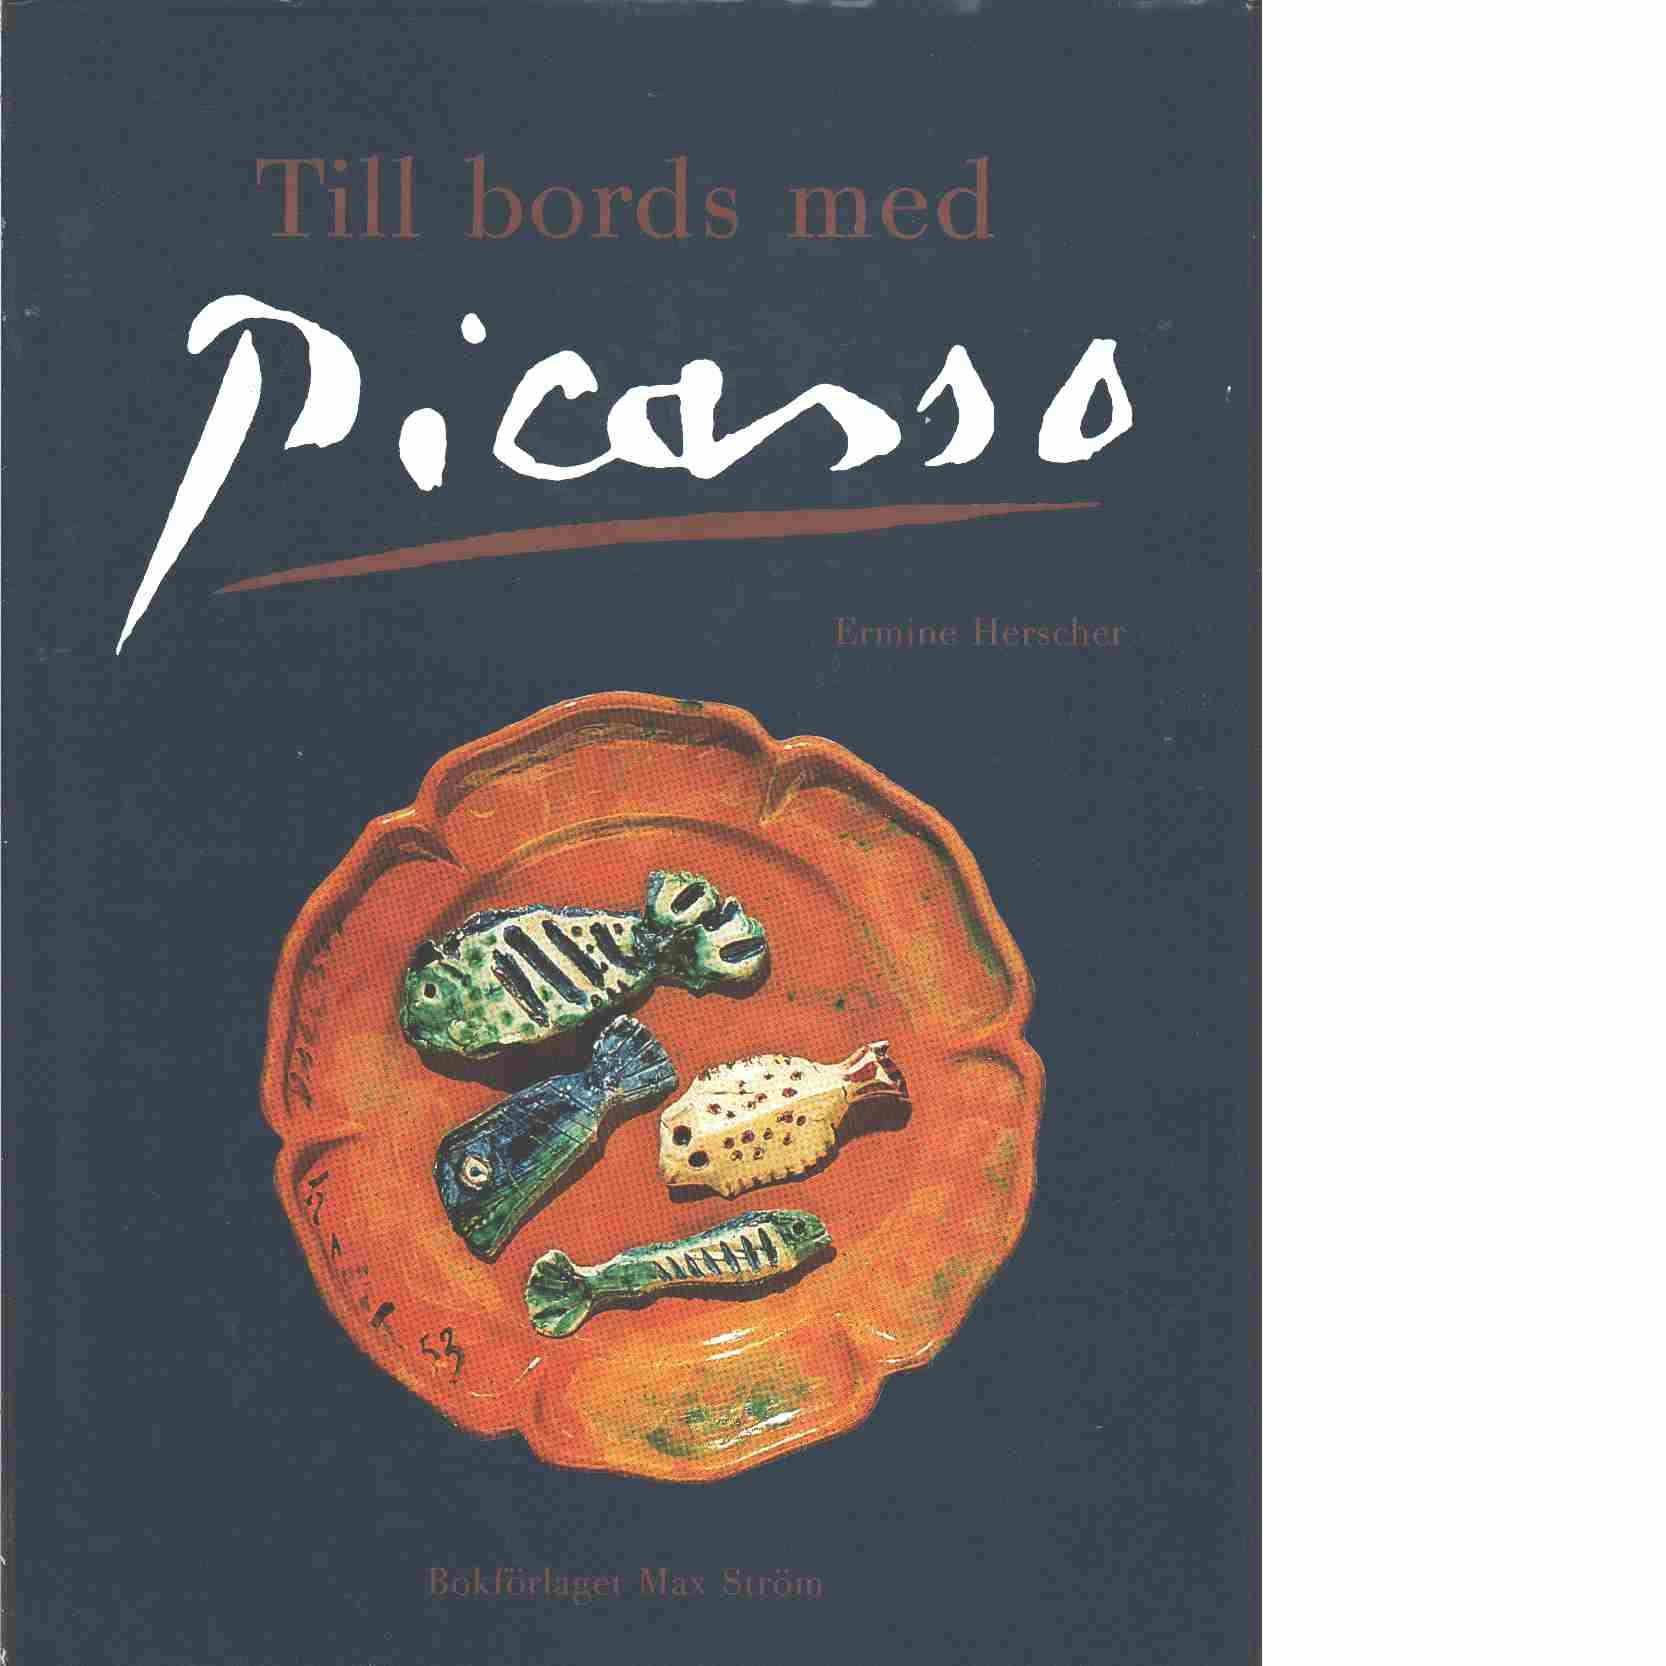 Till bords med Picasso  - Herscher, Ermine